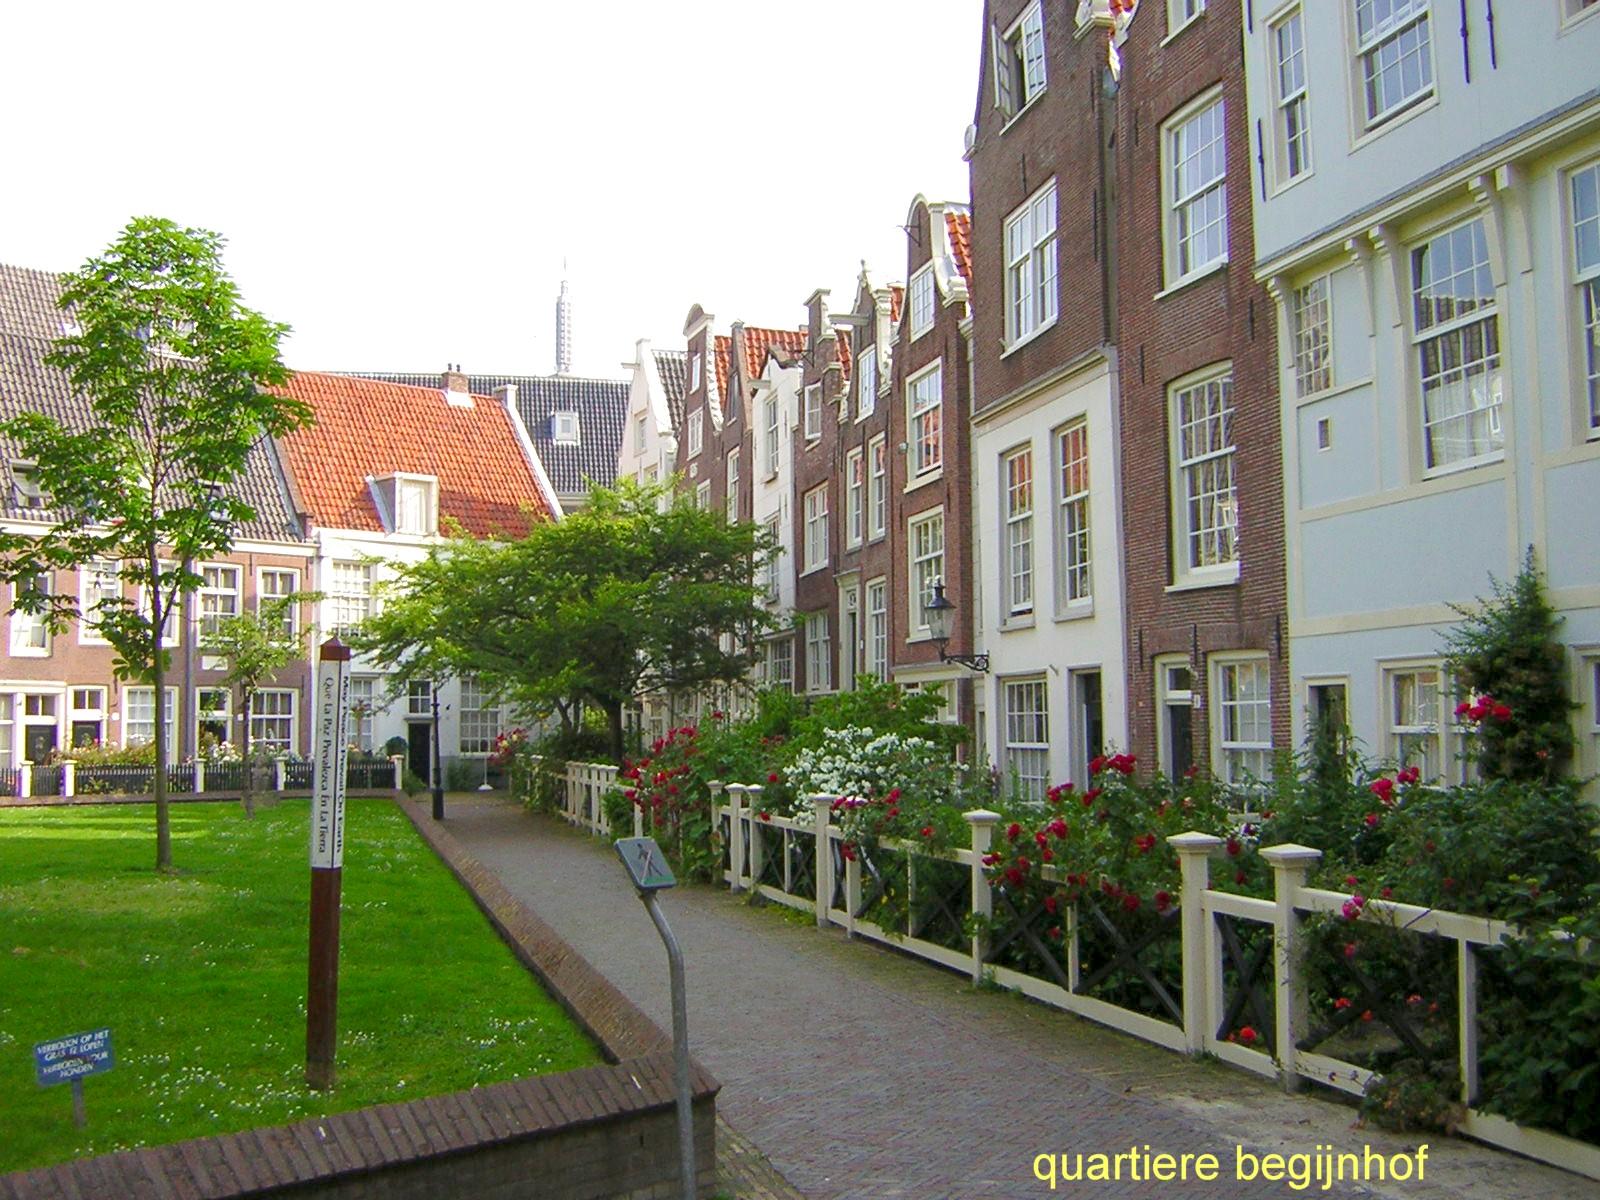 Amsterdam Begijnhof, l'oasi di pace delle Beghine